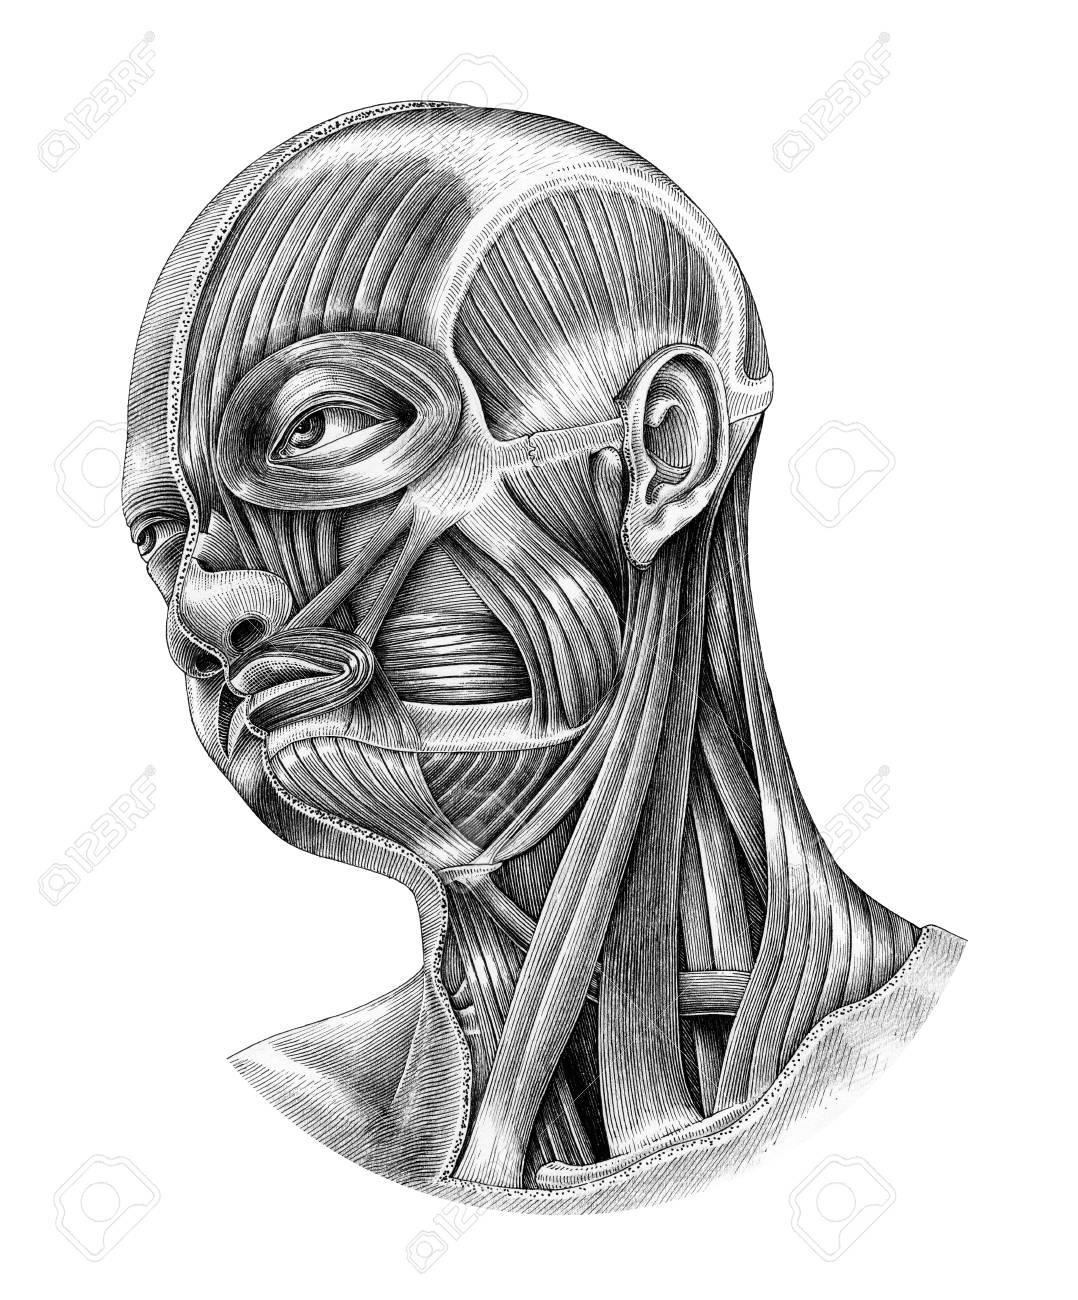 human head and neck anatomy diagram illustration vintage style isolate on  white background stock illustration -